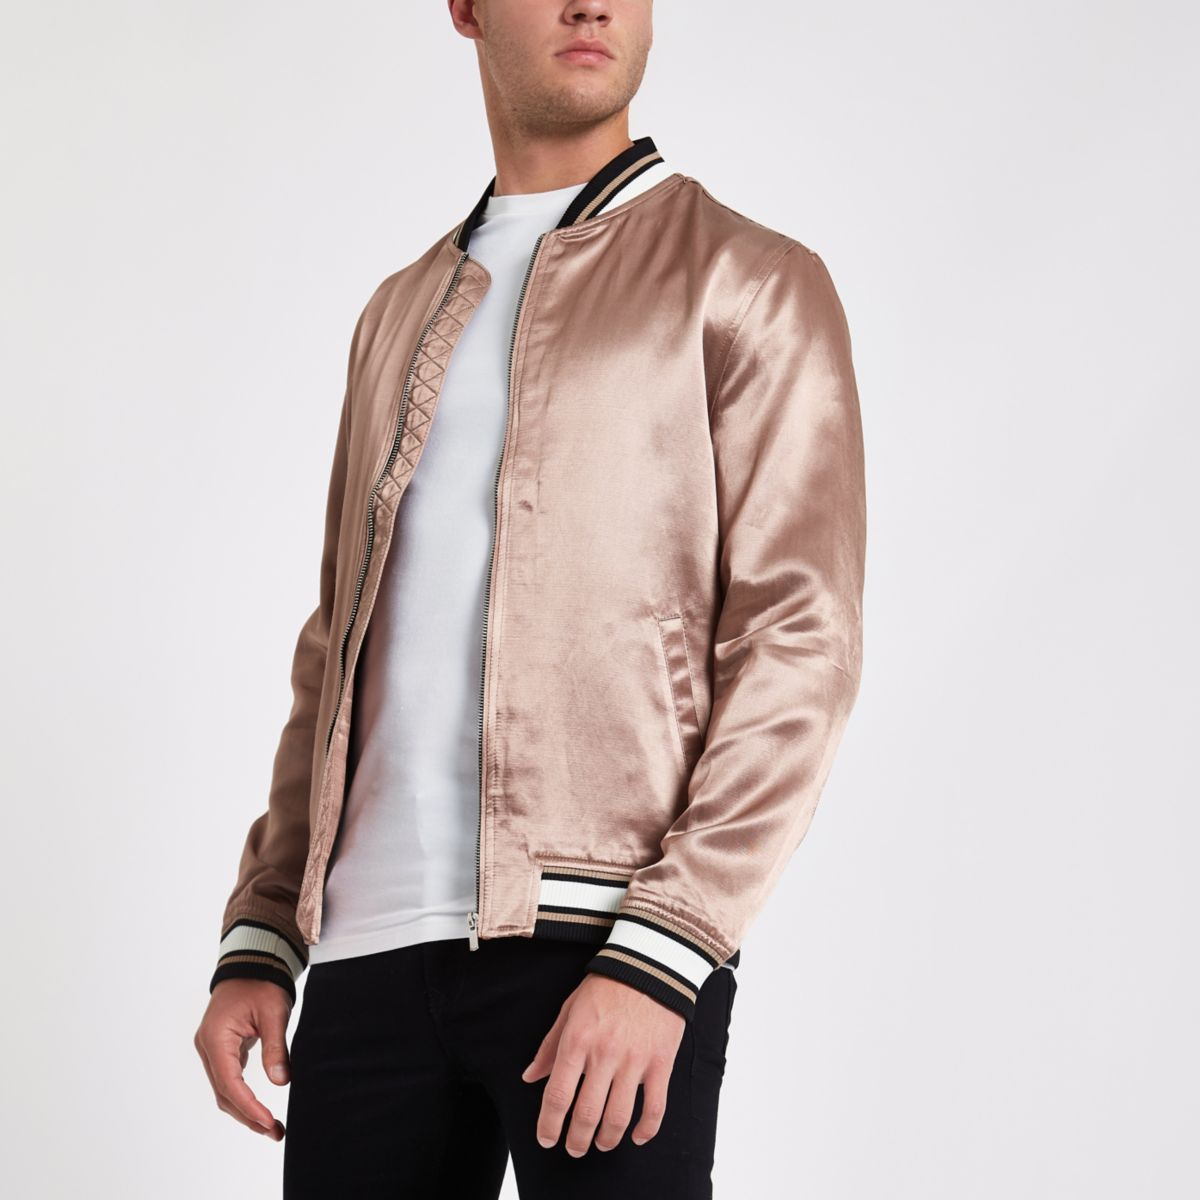 Dusty pink satin look bomber jacket